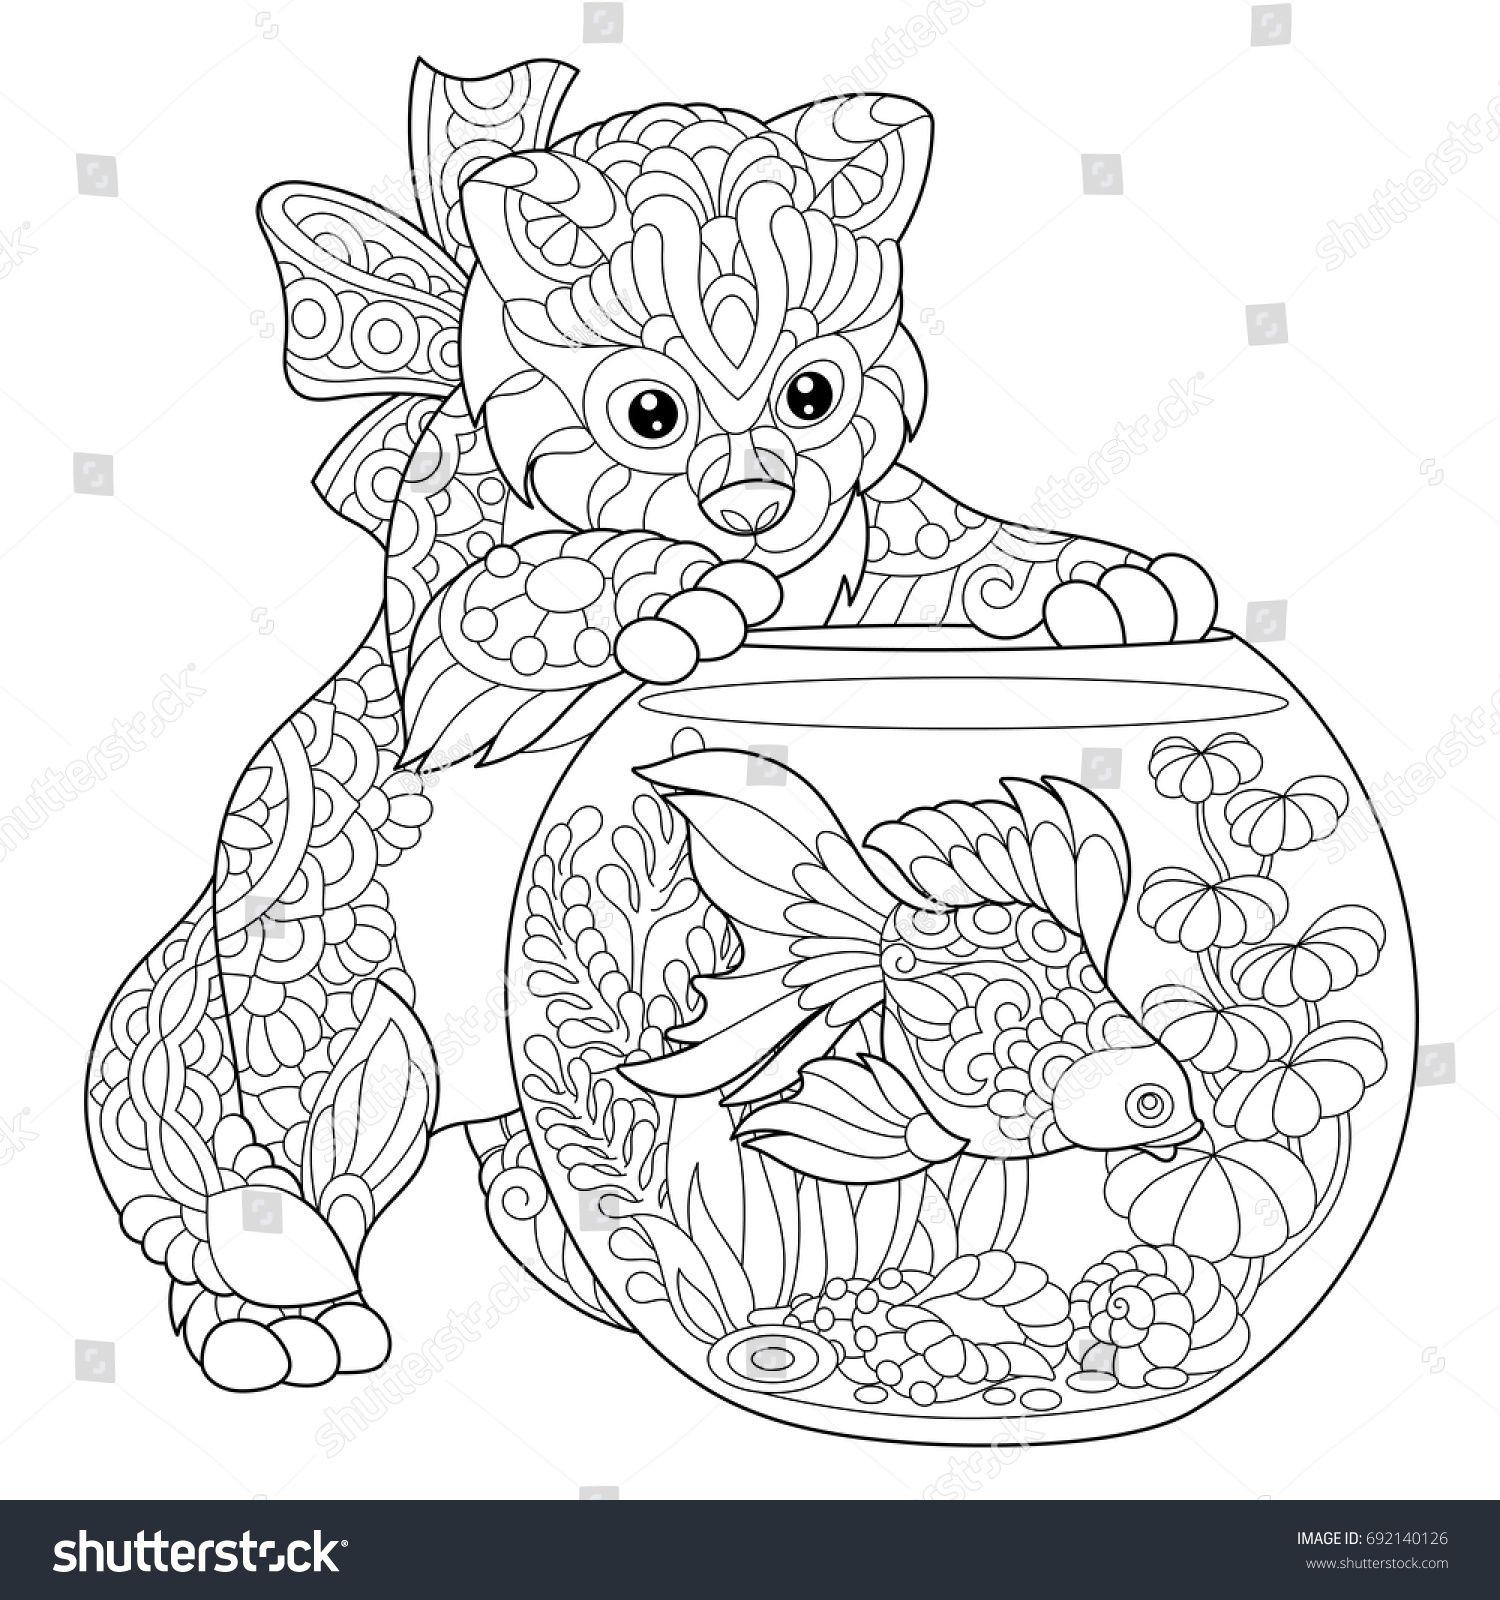 Coloring page of kitten wondering